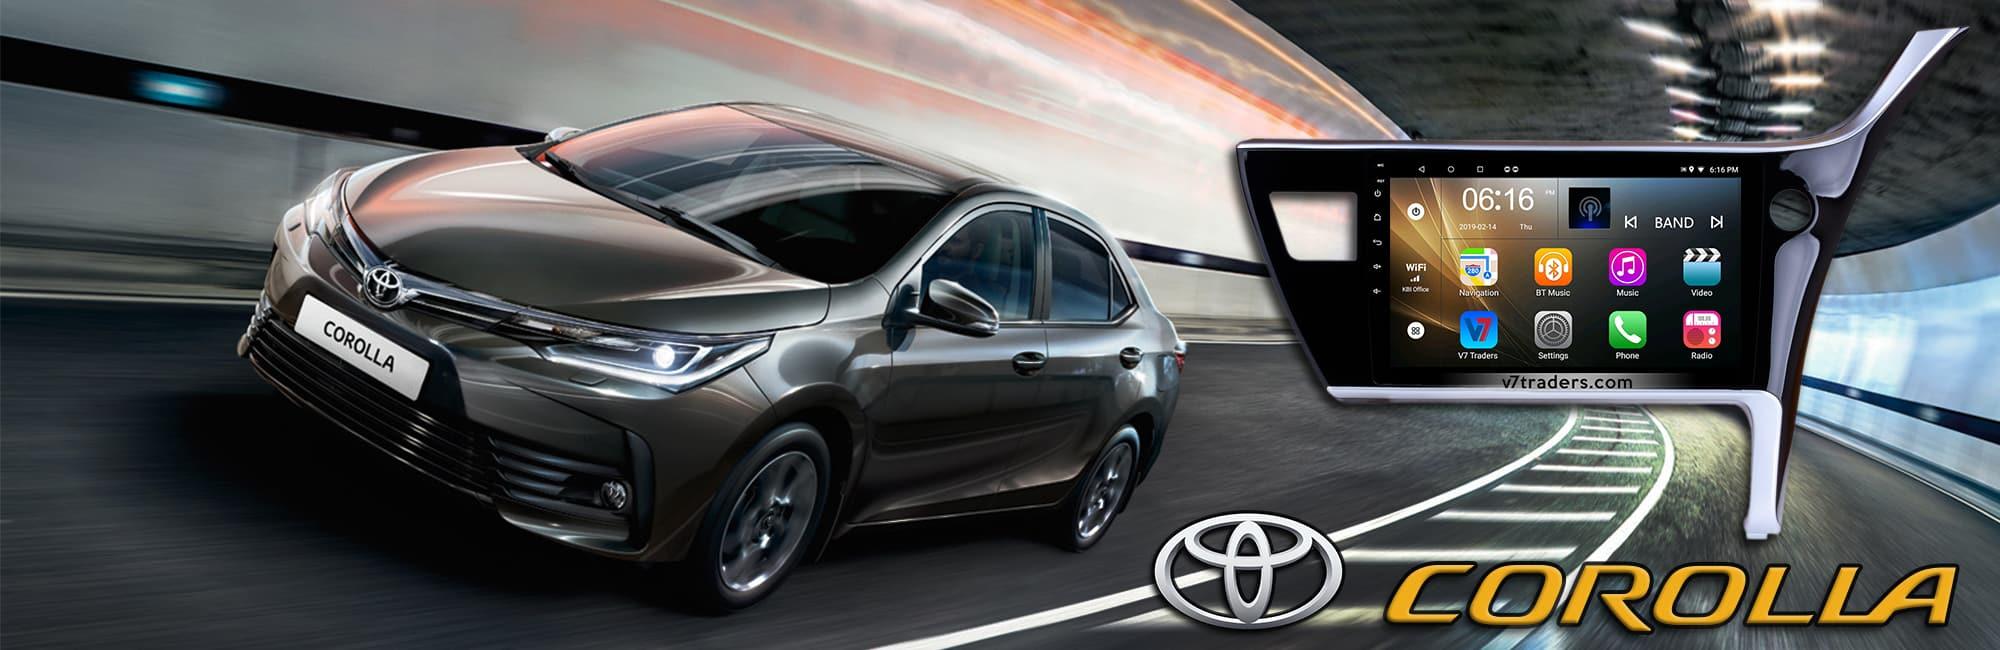 Toyota Corolla 2018 Navigation